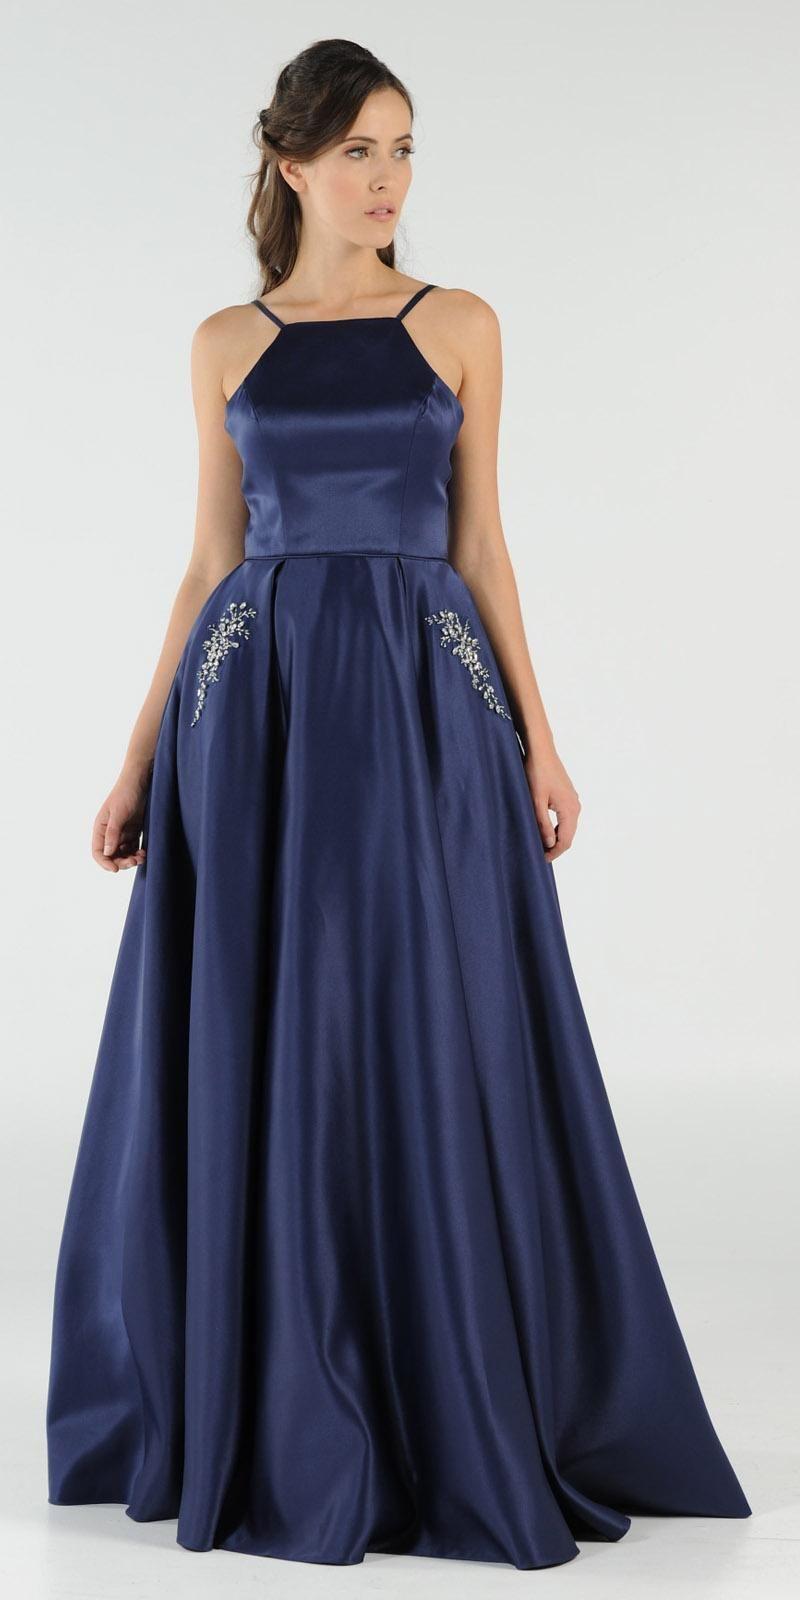 Navy Blue Long Satin Prom Dress Halter Spaghetti Strap with Pockets